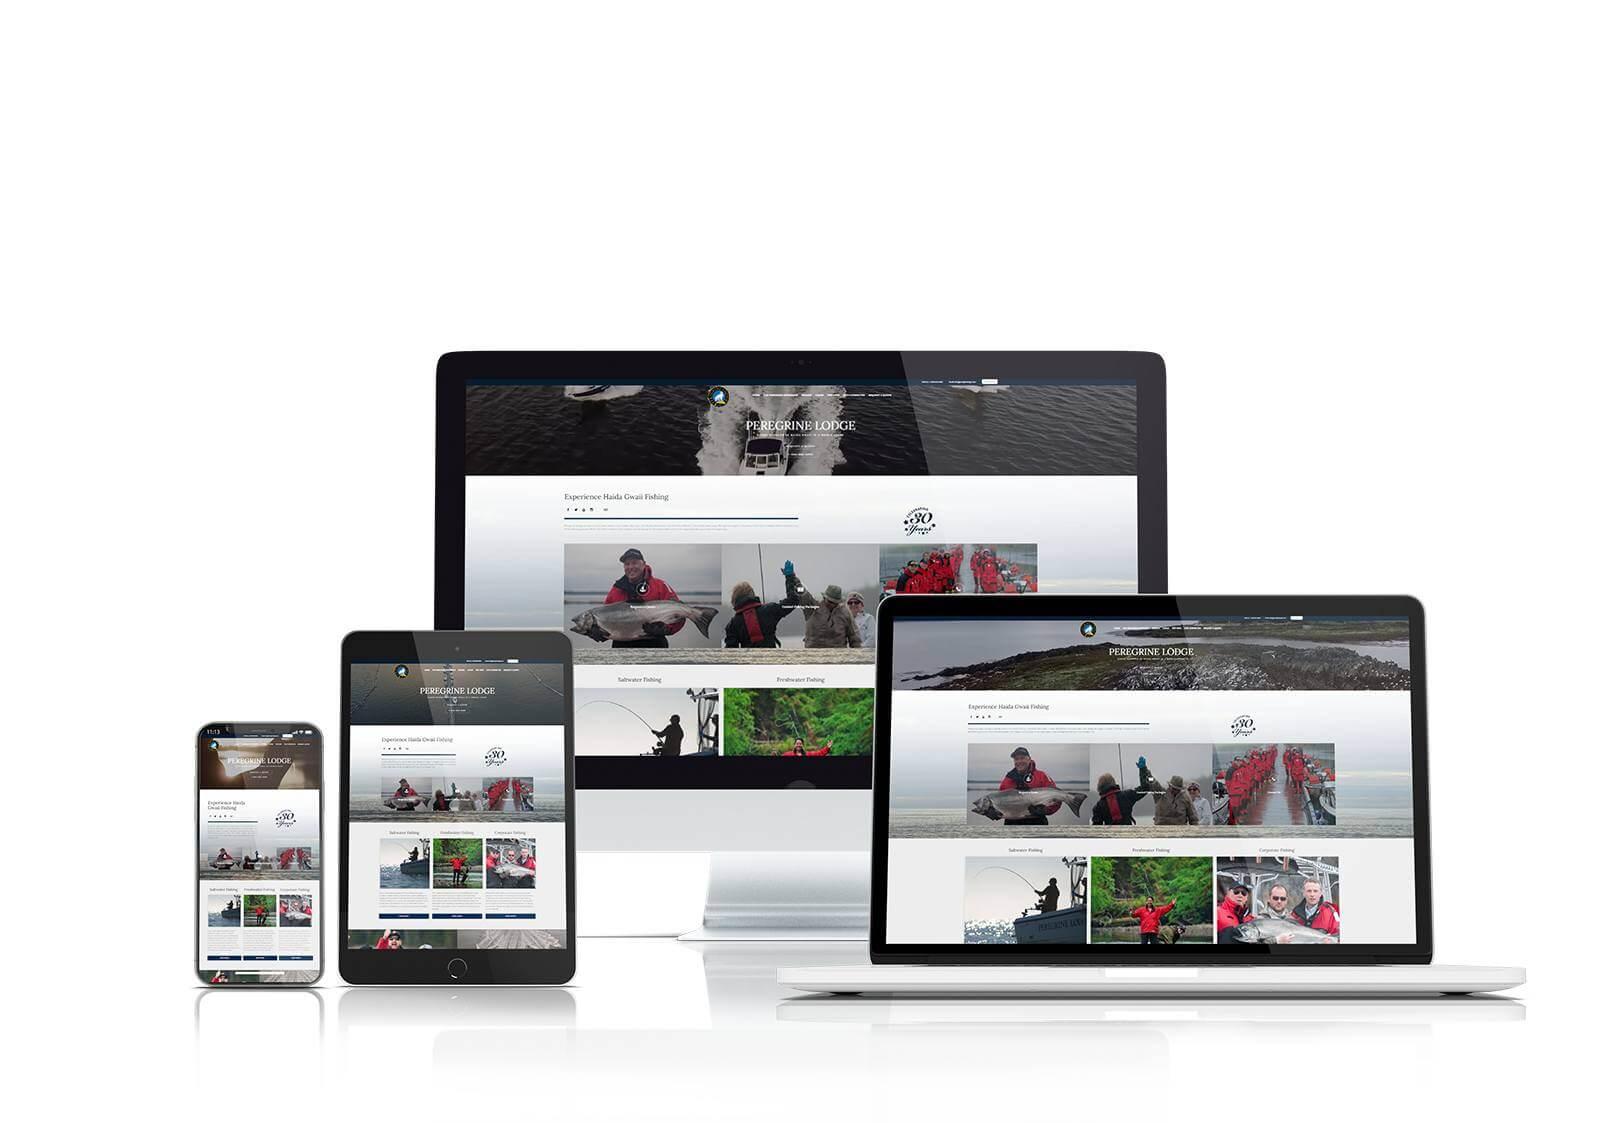 Peregrine Lodge website